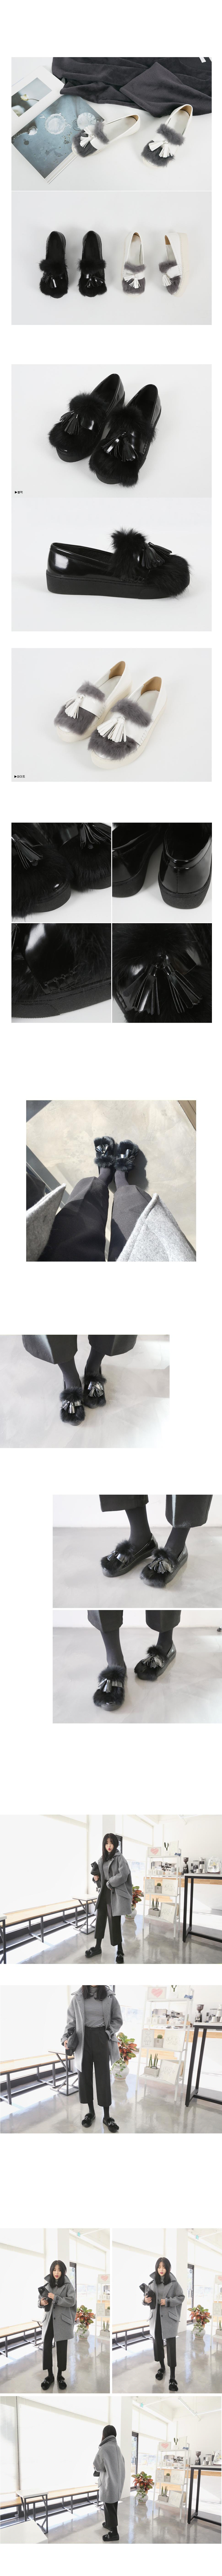 Primer sh - Black 230,240